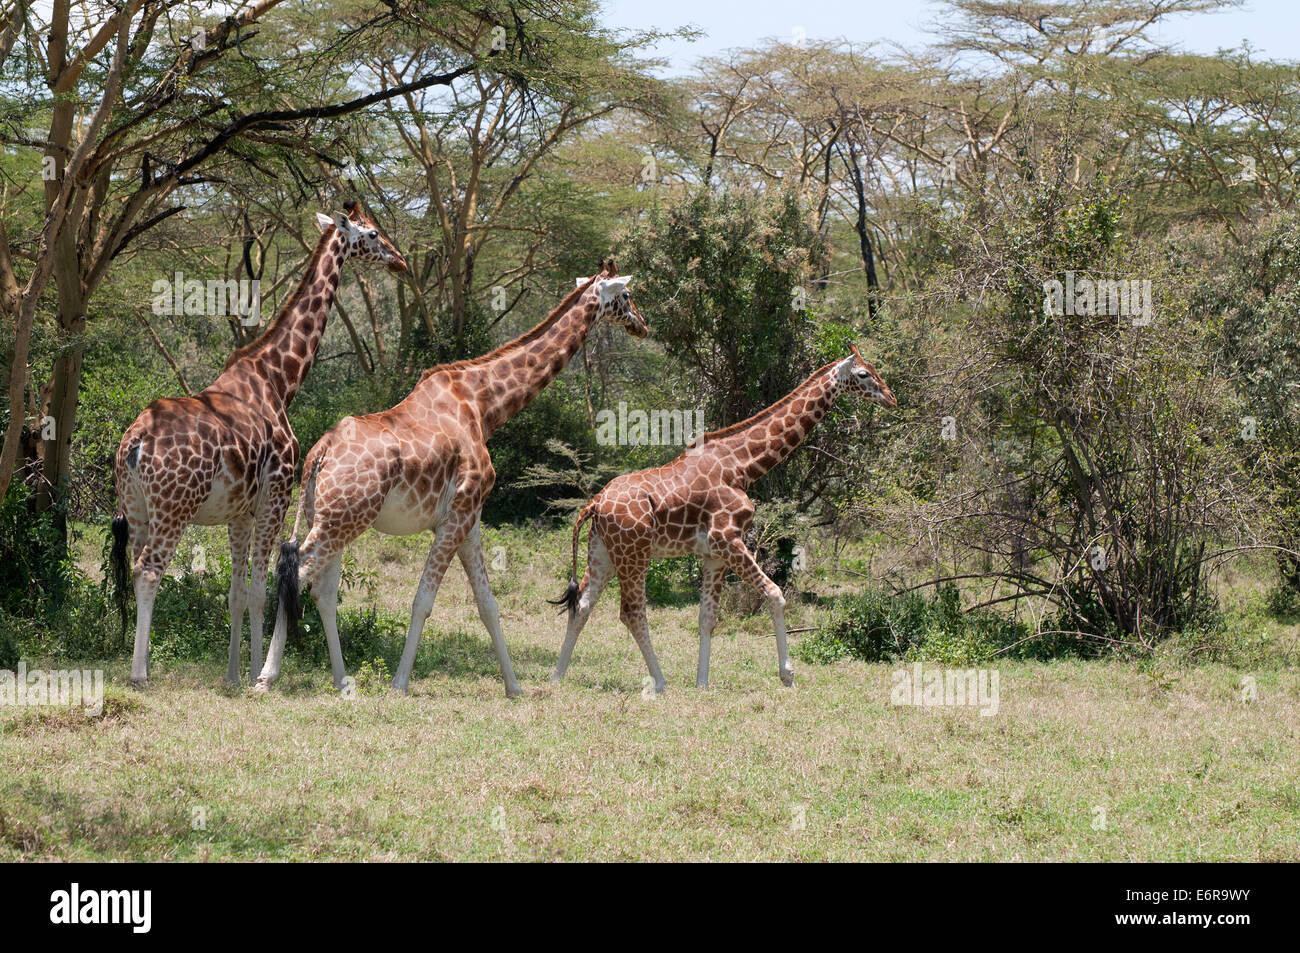 Three Rothschilds Giraffes in acacia woodland in Lake Nakuru National Park Kenya East Africa - Stock Image